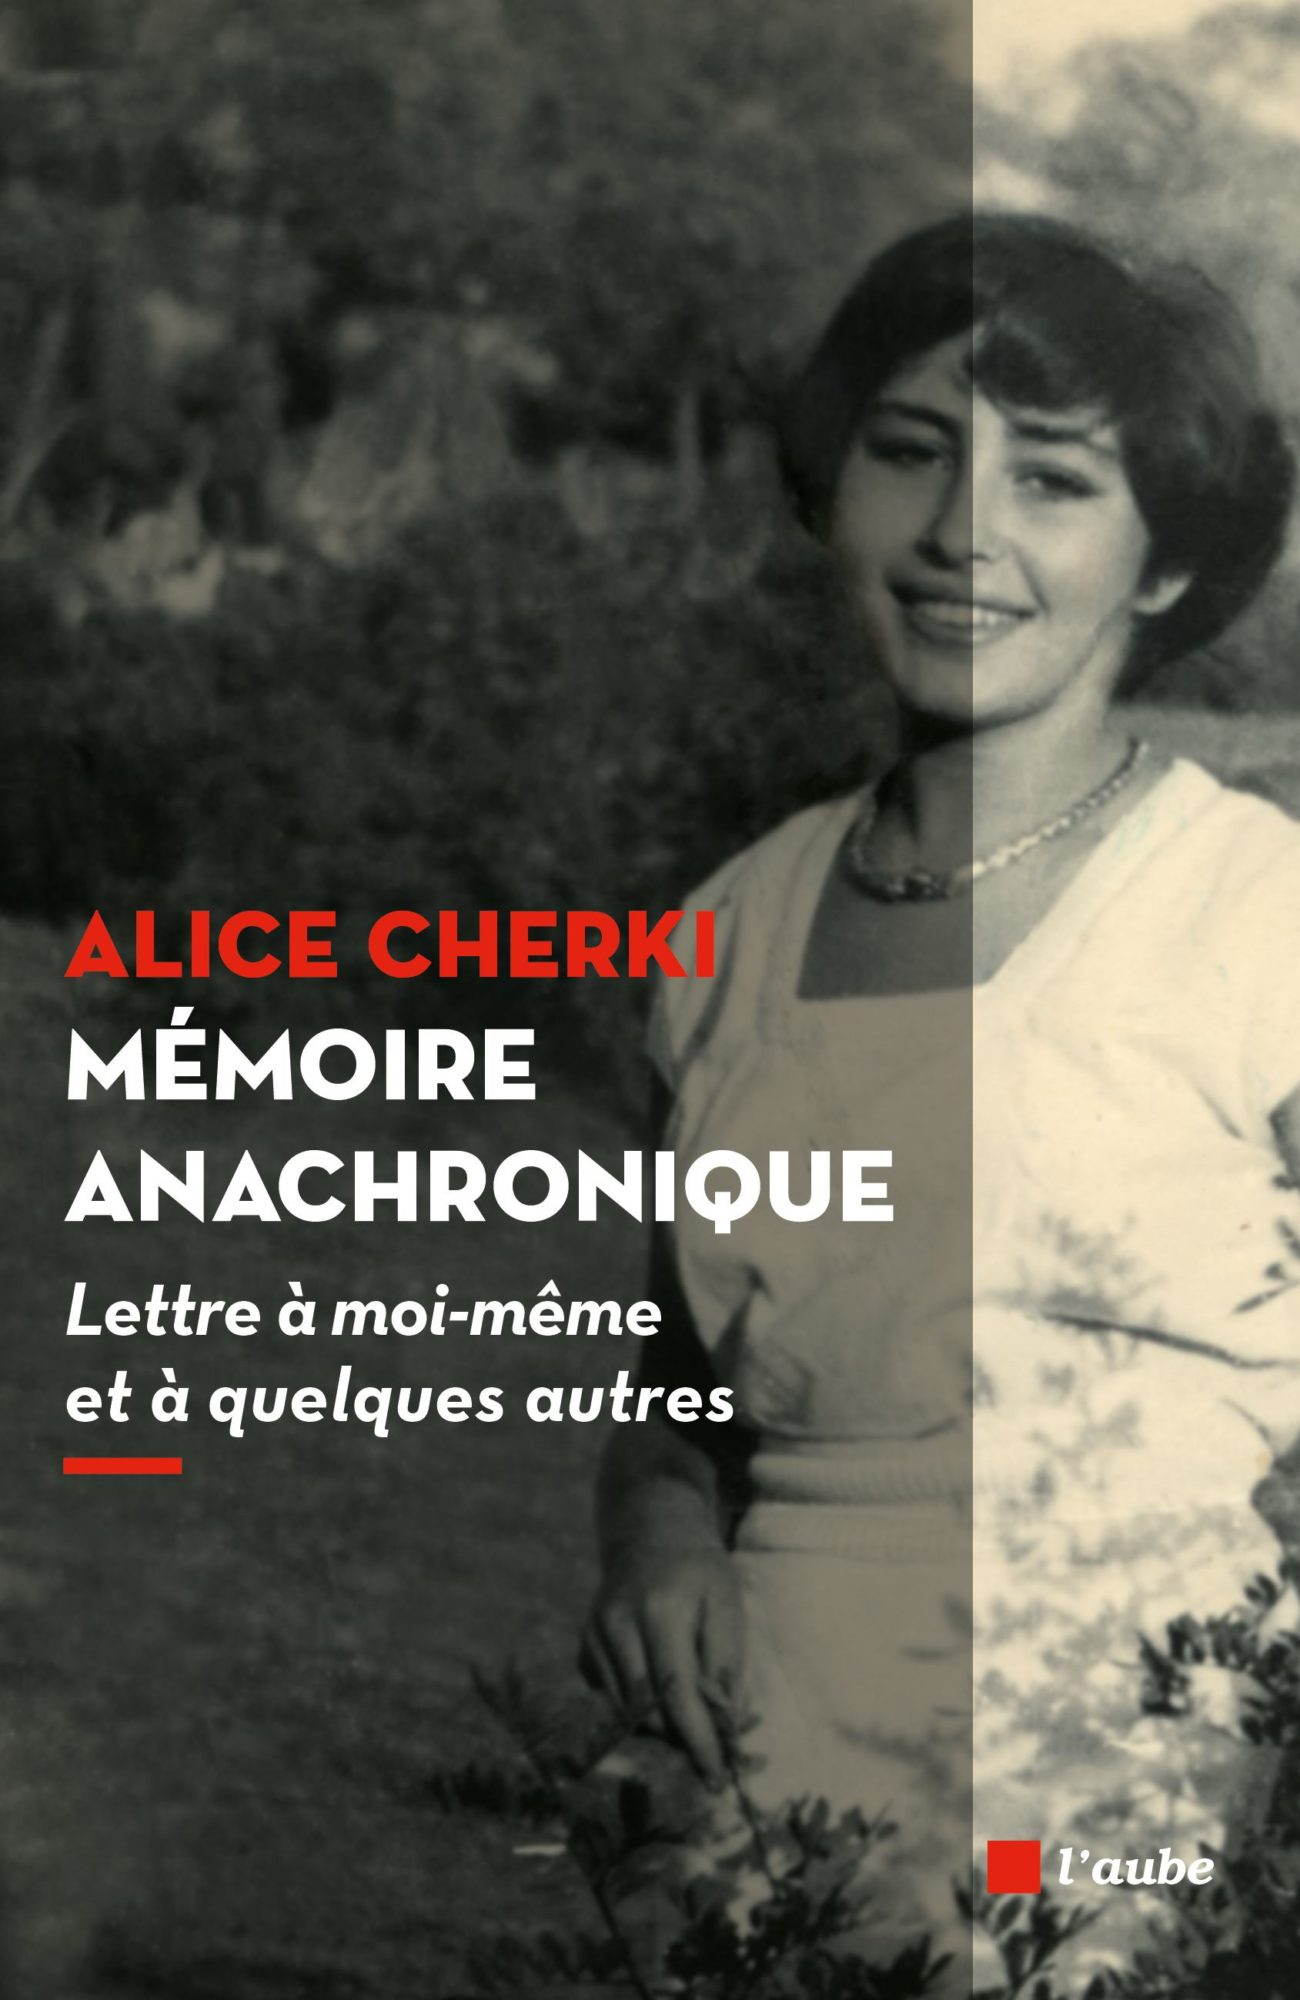 Mémoire anachronique